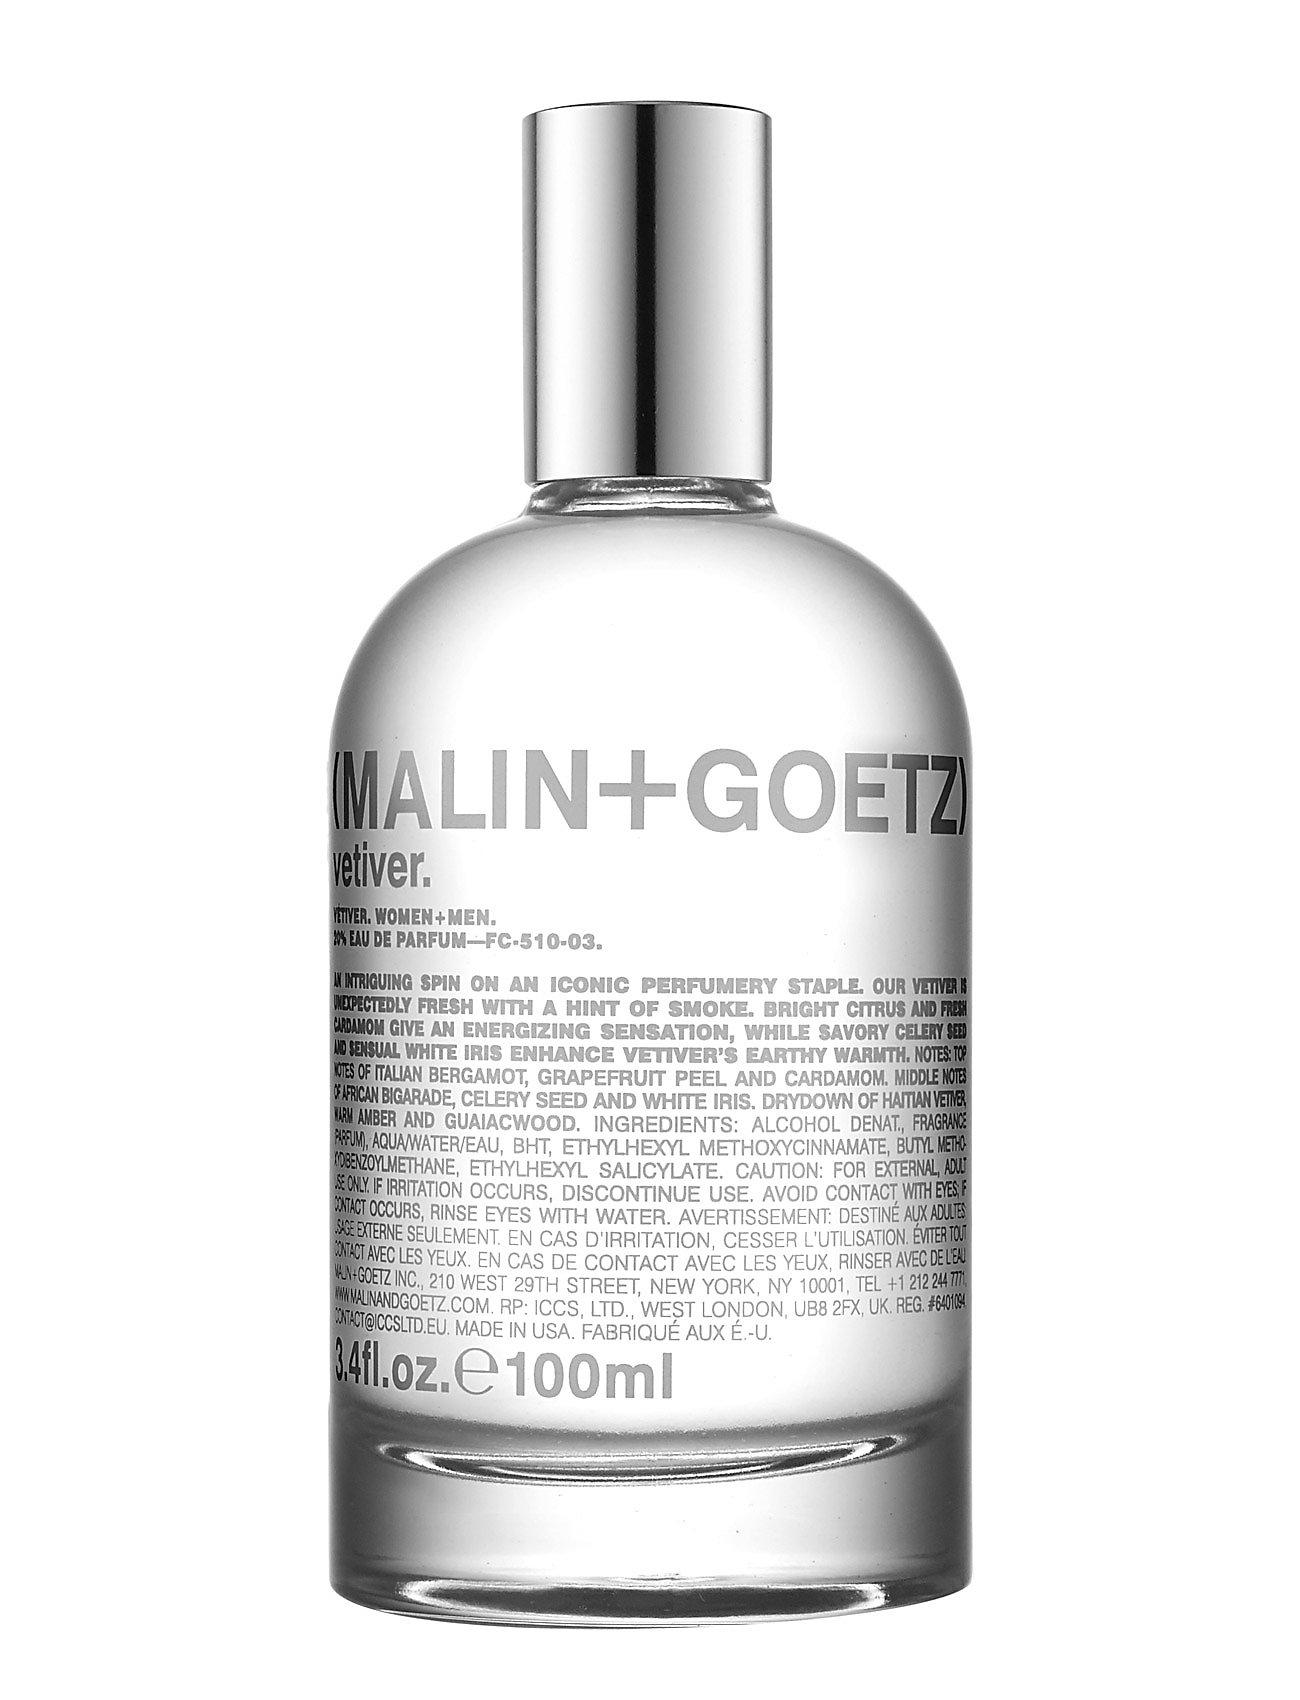 Vetiver eau de parfume fra malin+goetz på boozt.com dk